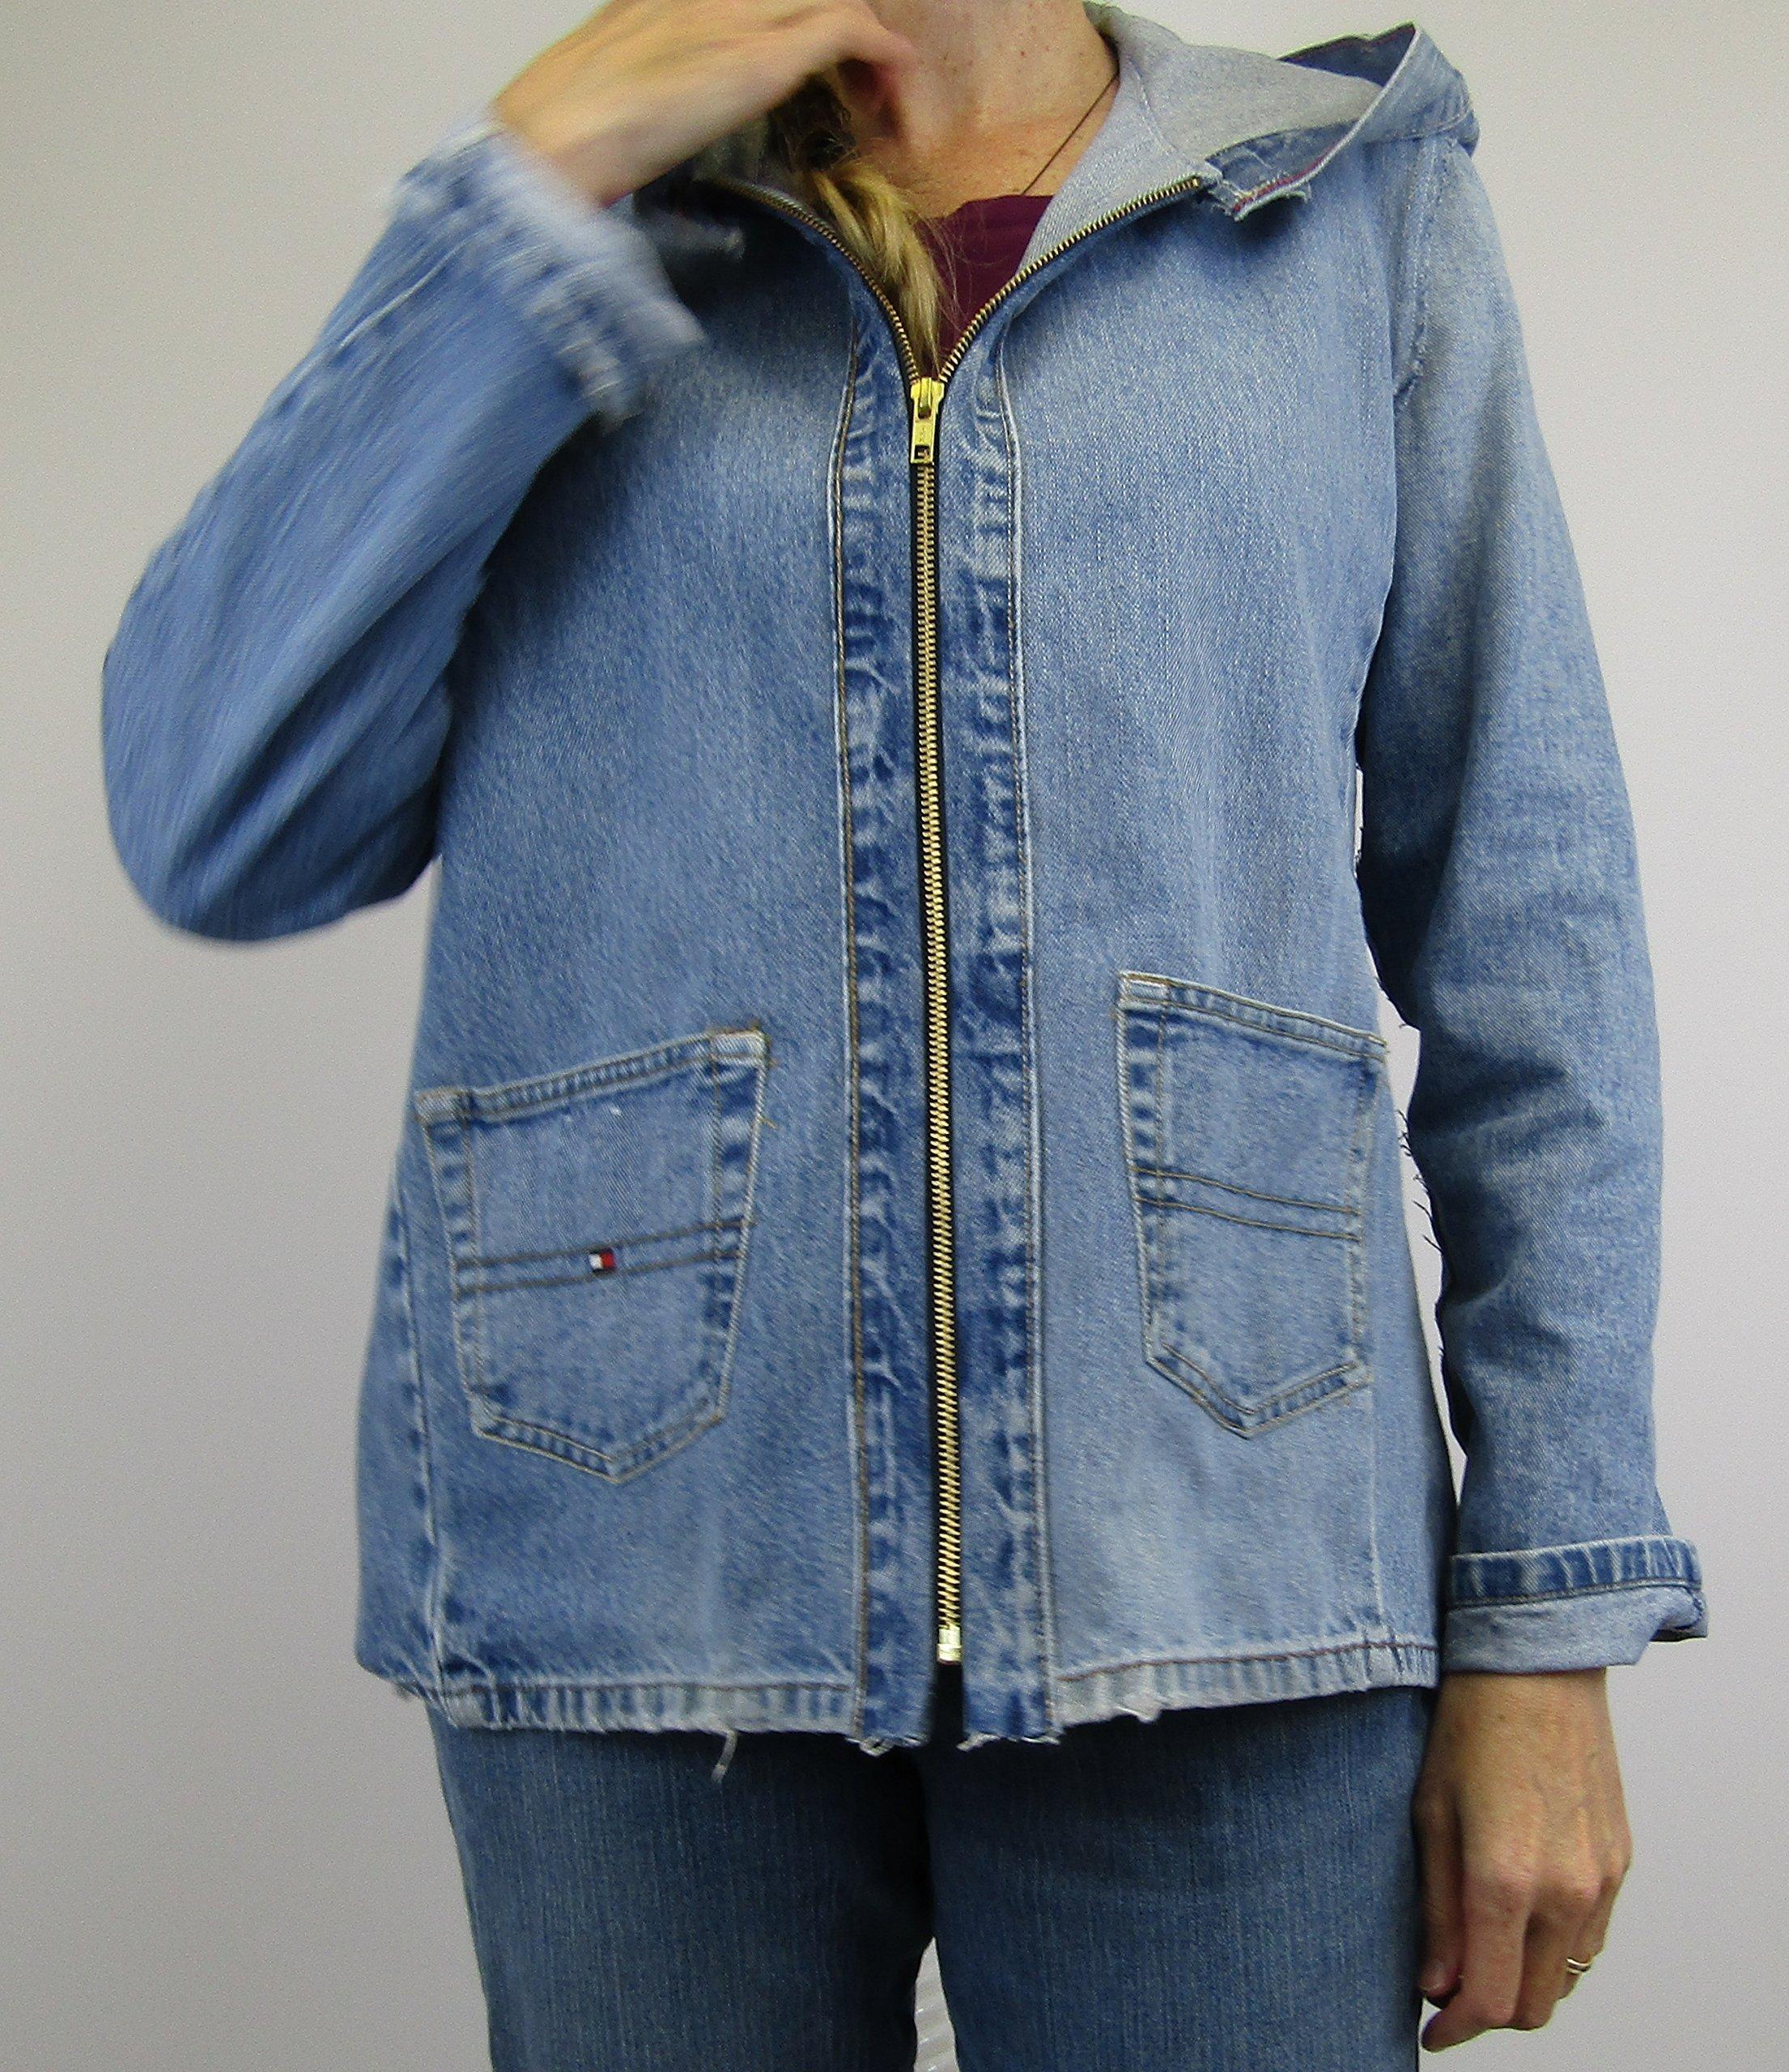 Hooded Denim Jacket Medium eco friendly fashion